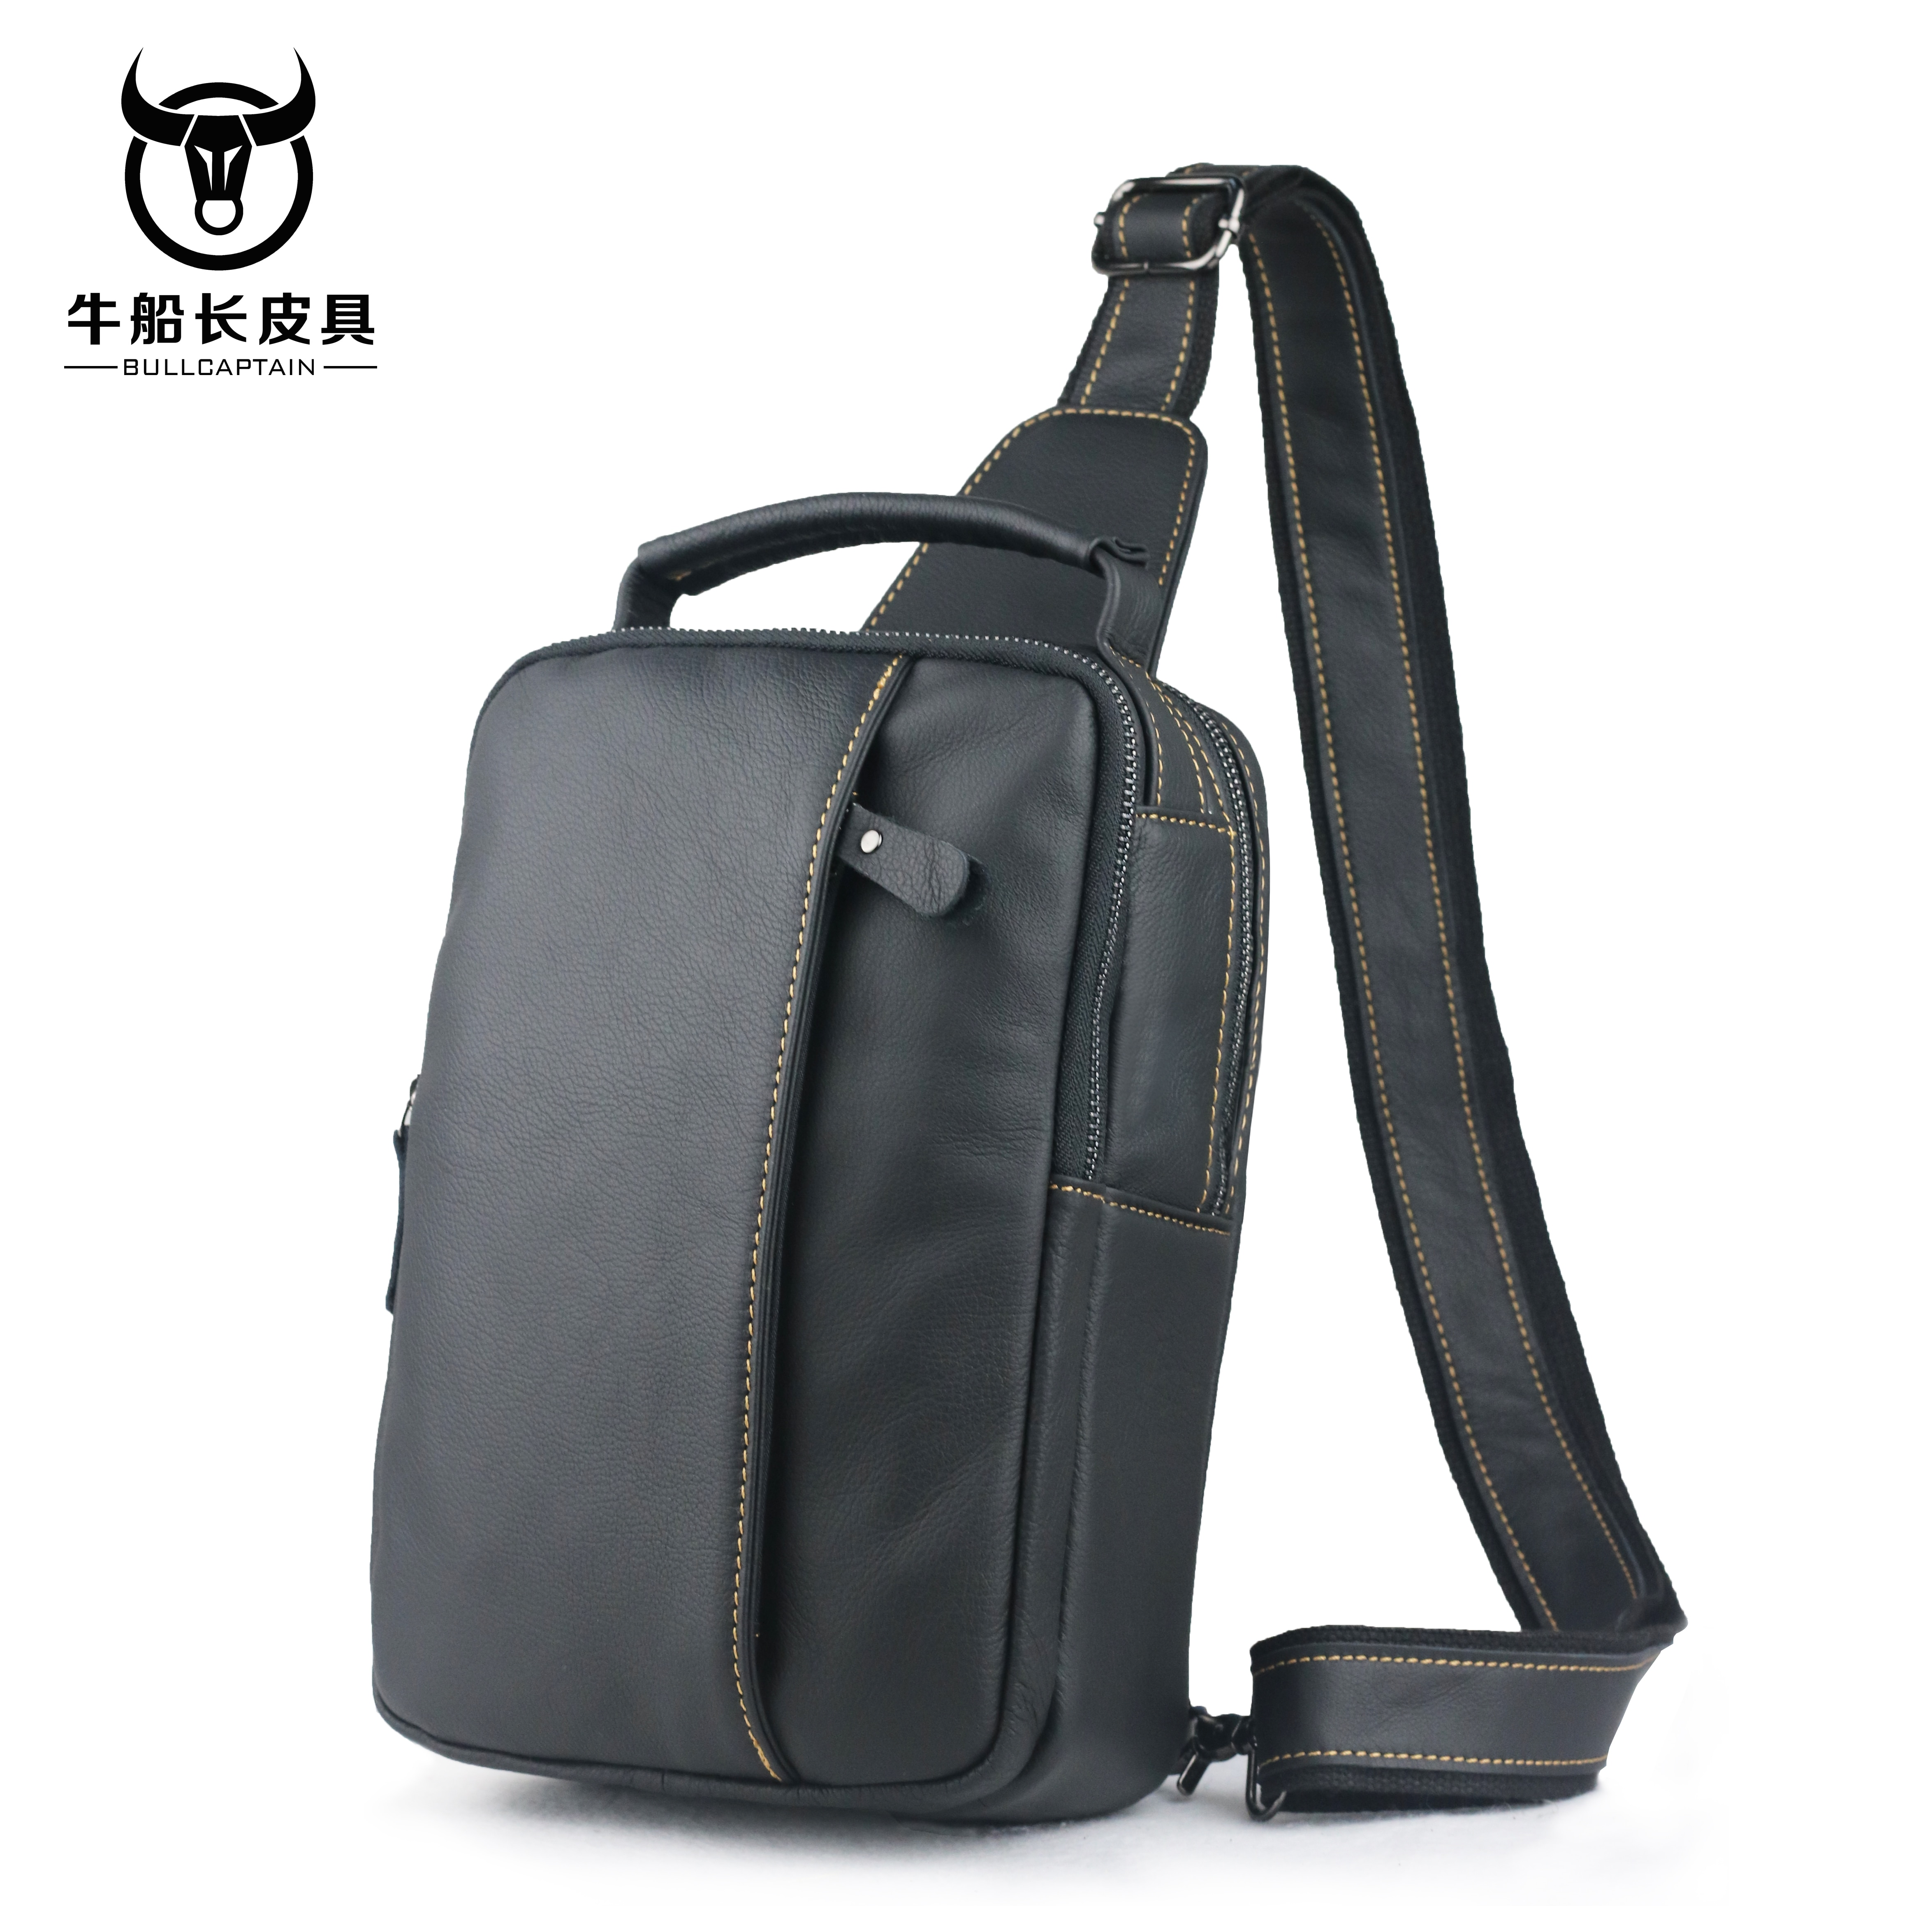 BULLCAPTAIN Crossbody Bags for Men Messenger Chest Bag Pack Casual Bag Waterproof Nylon Single Shoulder Strap Pack 2018 Fashion